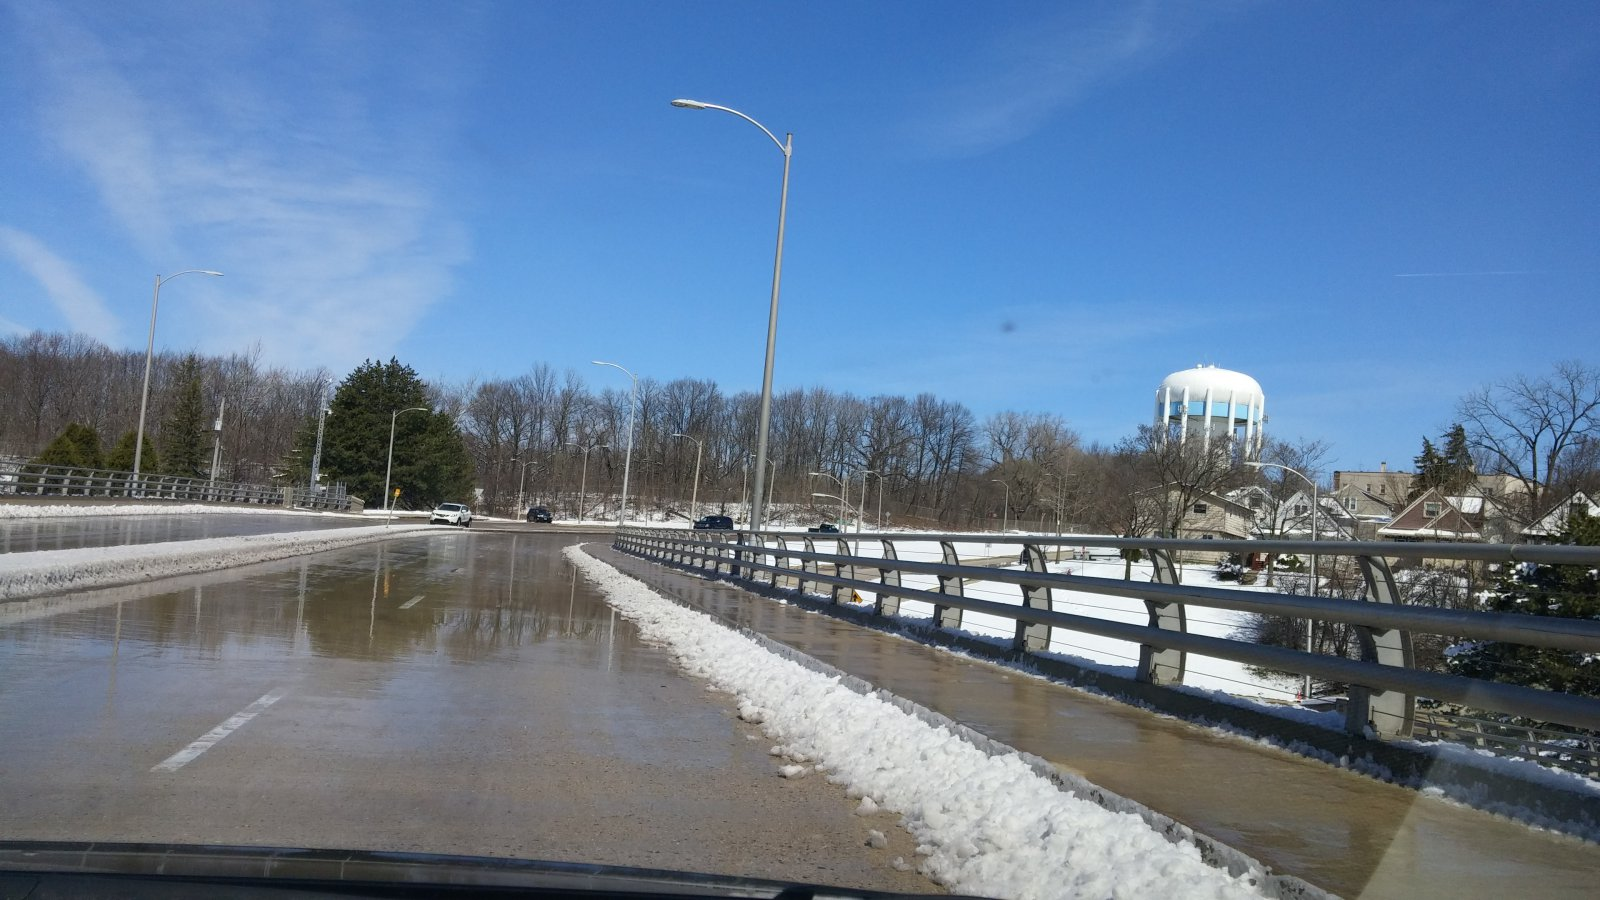 N. Hawley Road passes over the Menomonee River Valley